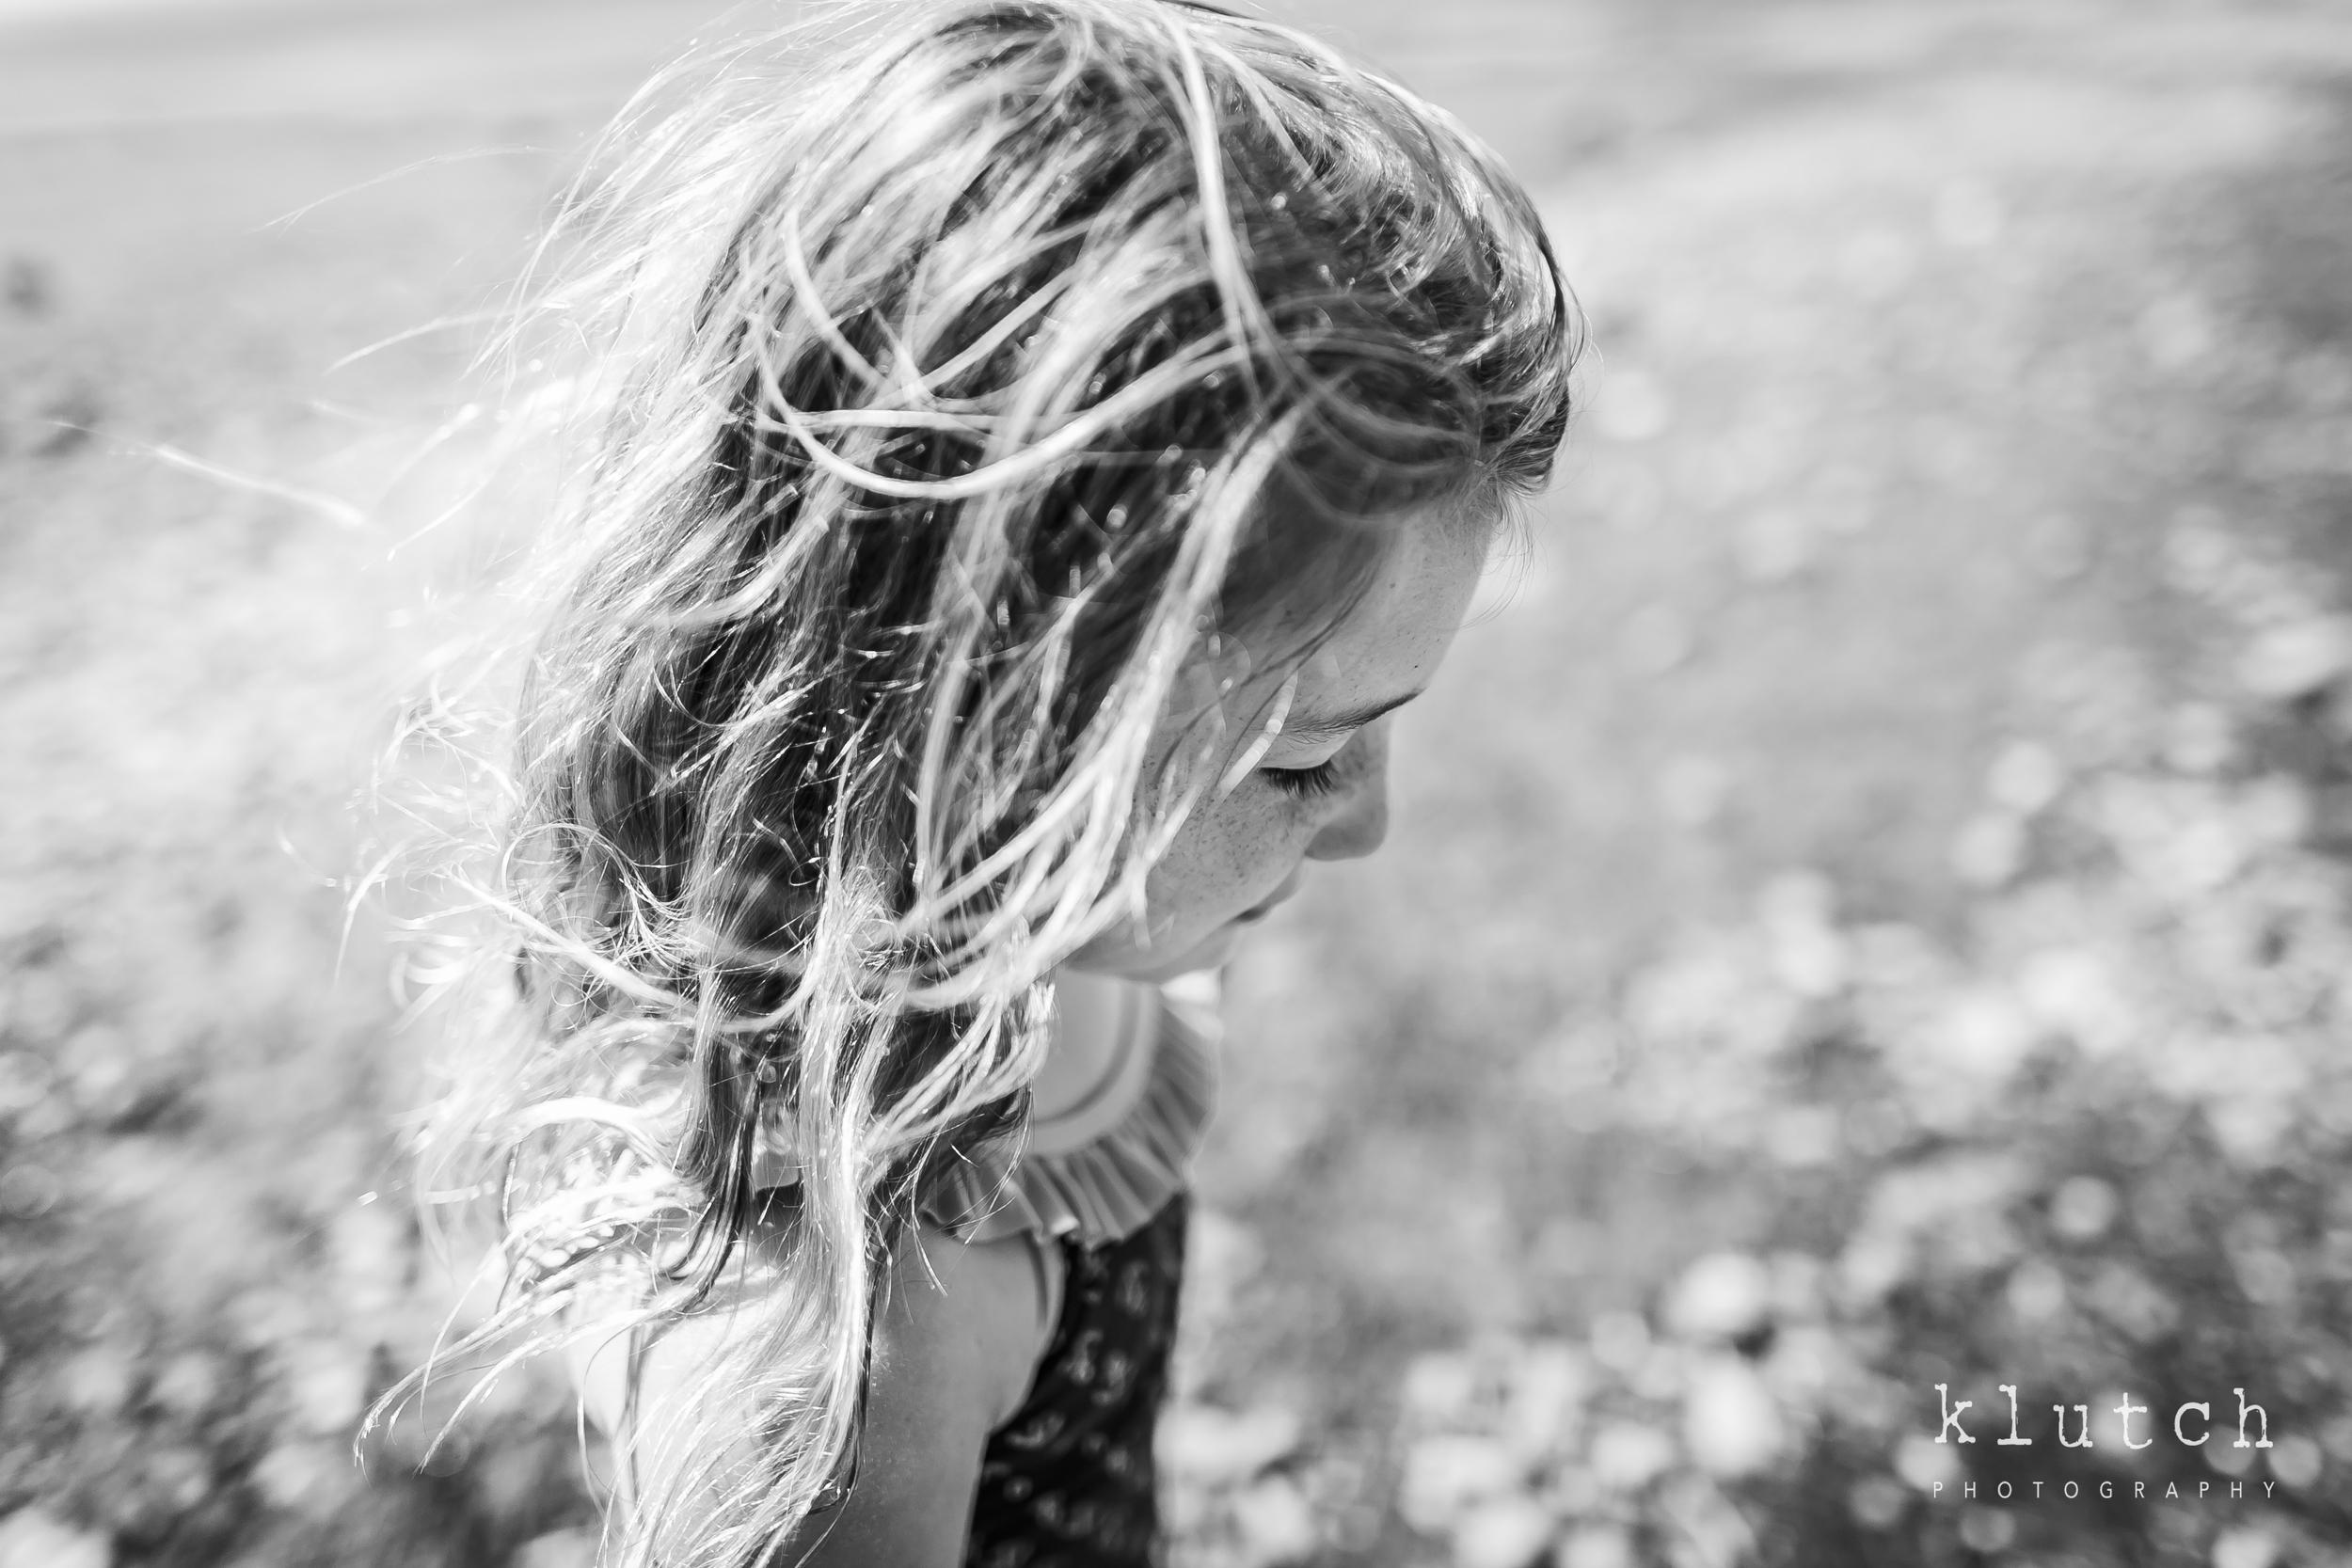 Klutch Photography,white rock family photographer, vancouver family photographer, whiterock lifestyle photographer, life unscripted photographer, life unscripted session, photography,Dina Ferreira Stoddard-5980.jpg